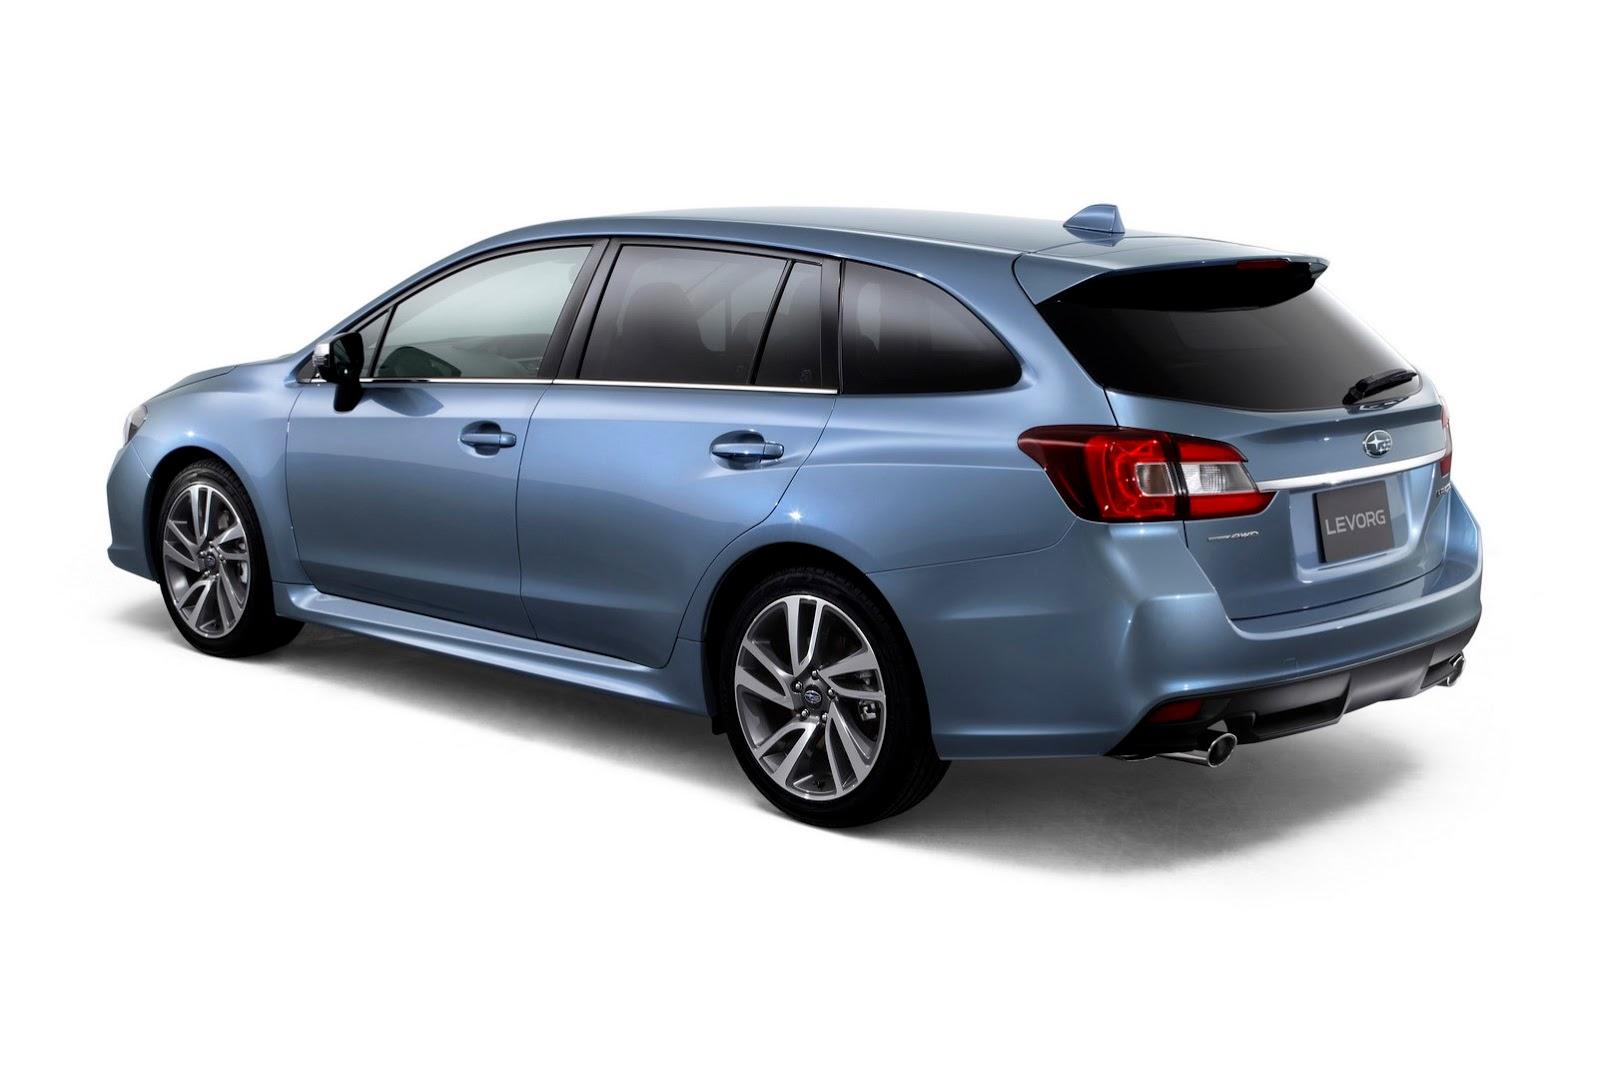 Subaru-Levorg-Concept-4[2]